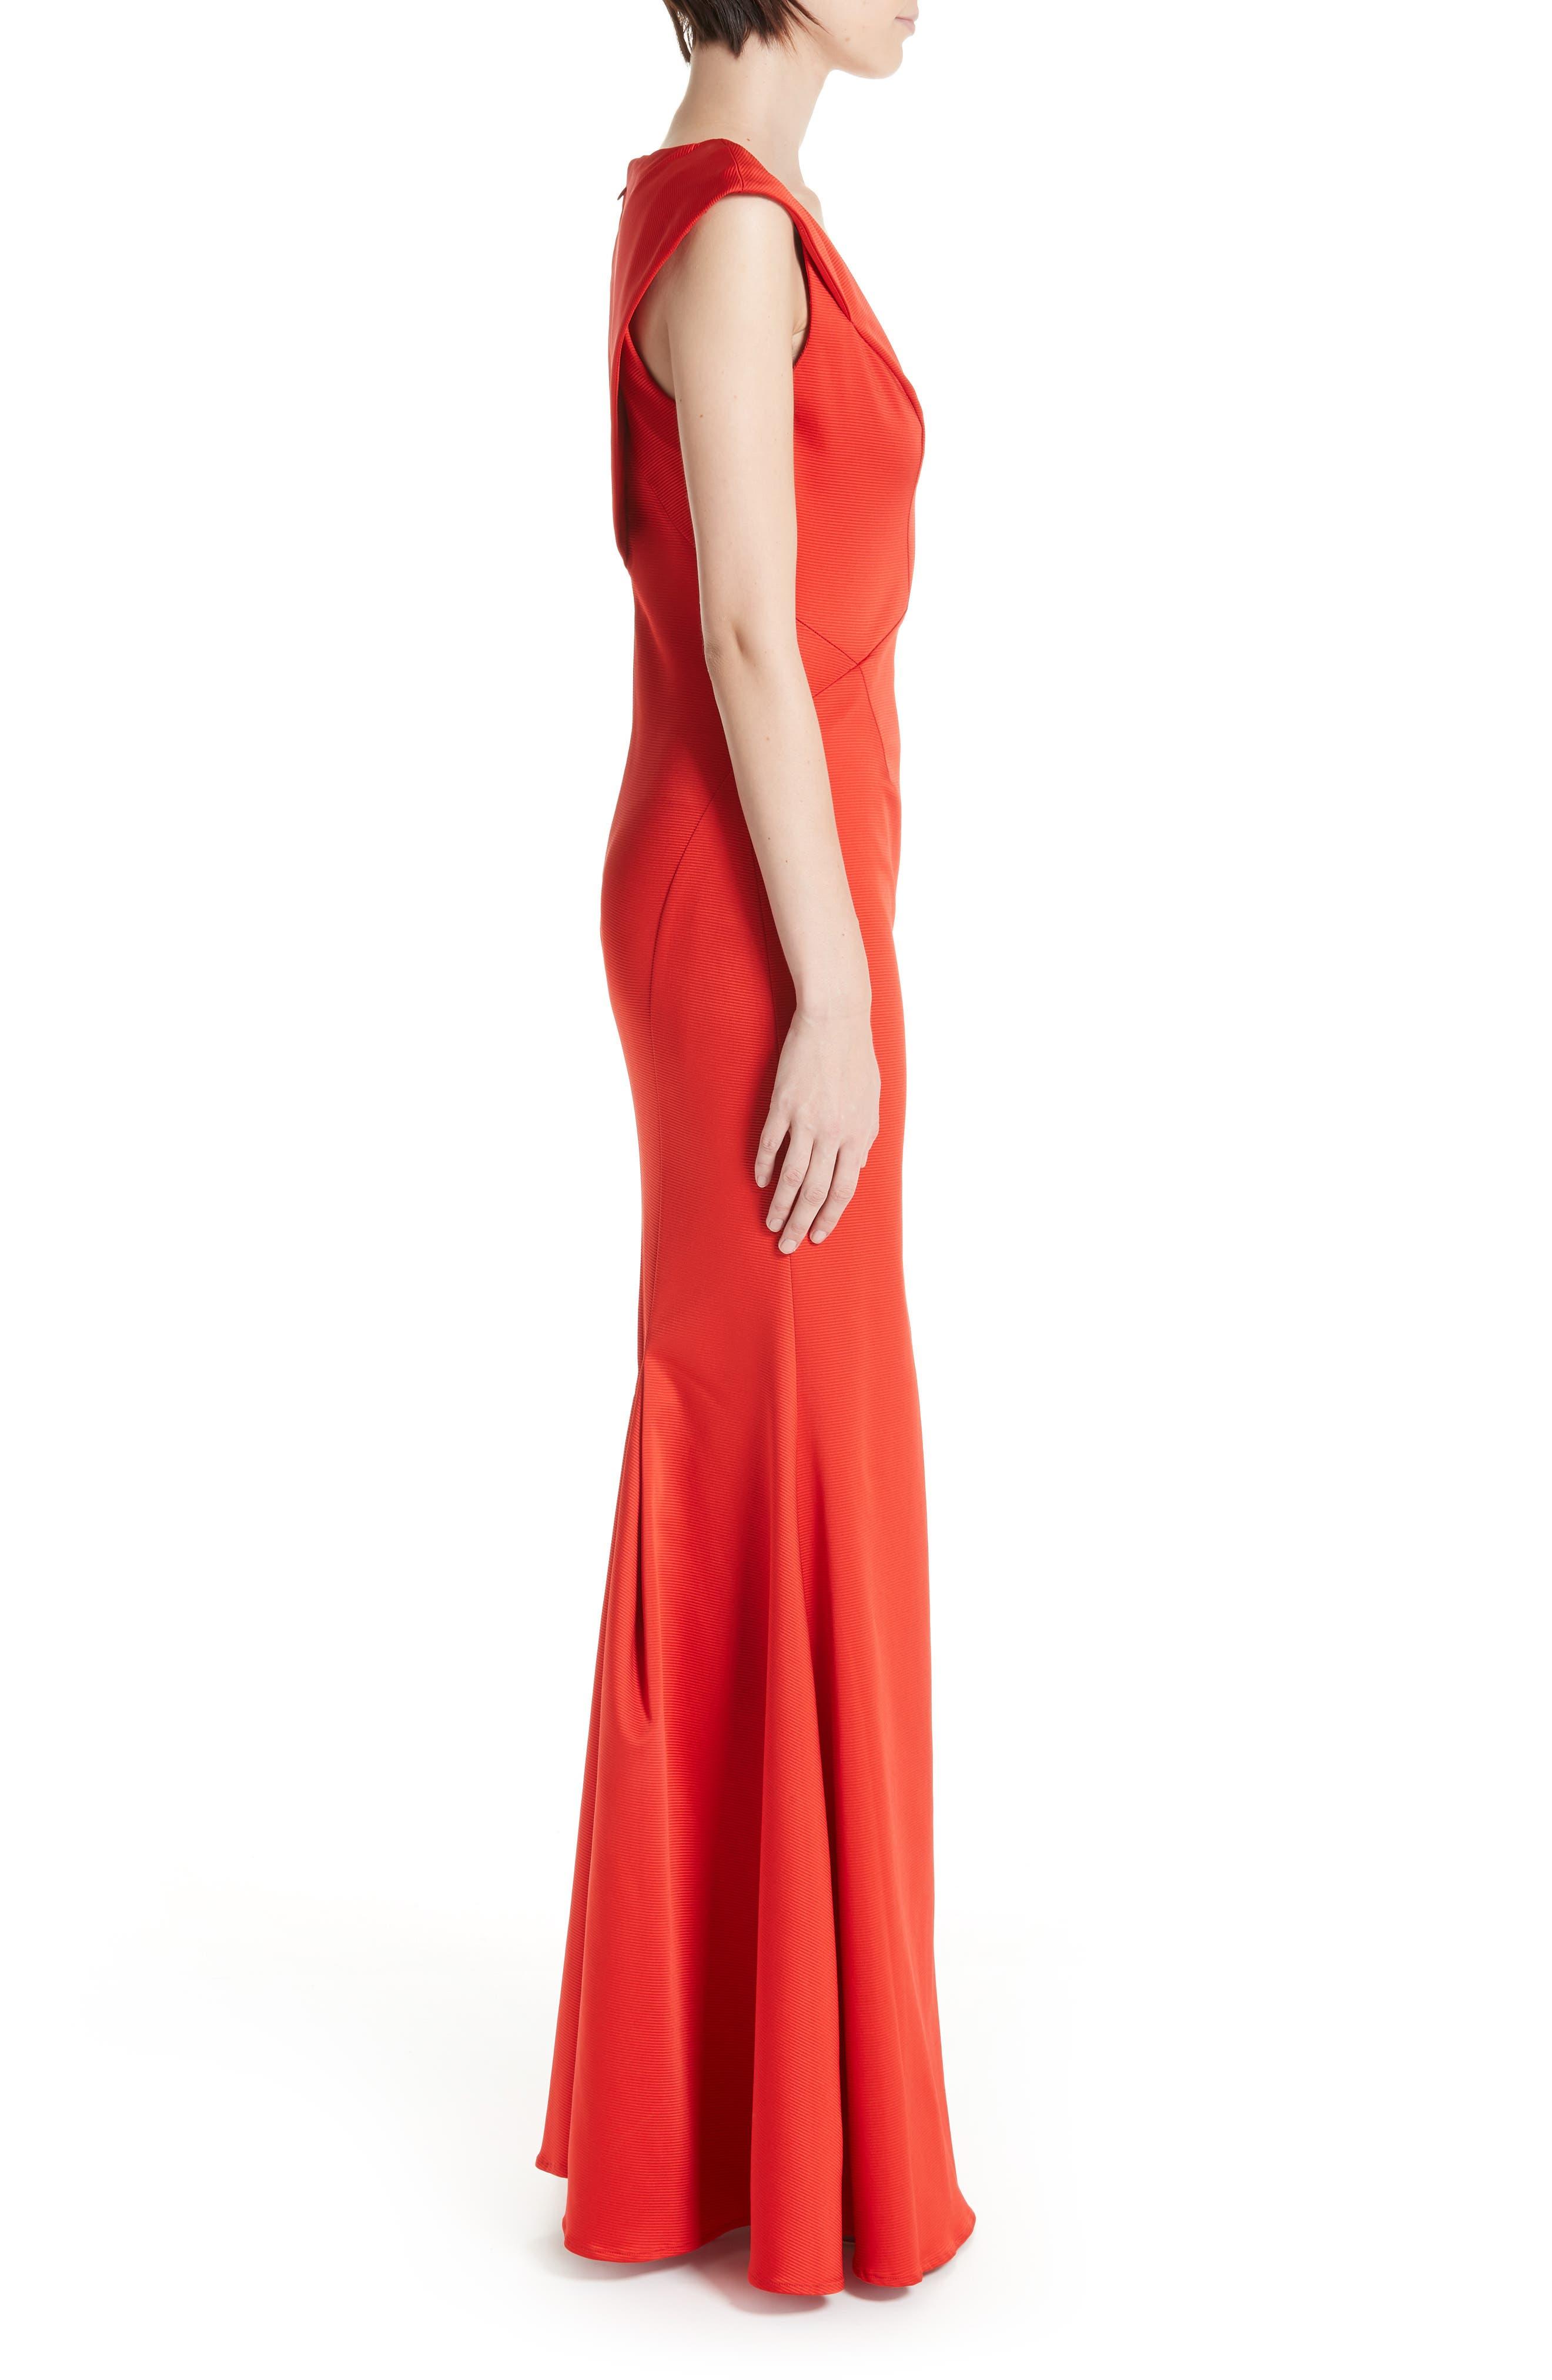 ZAC ZAC POSEN, Nina Trumpet Gown, Alternate thumbnail 4, color, RED